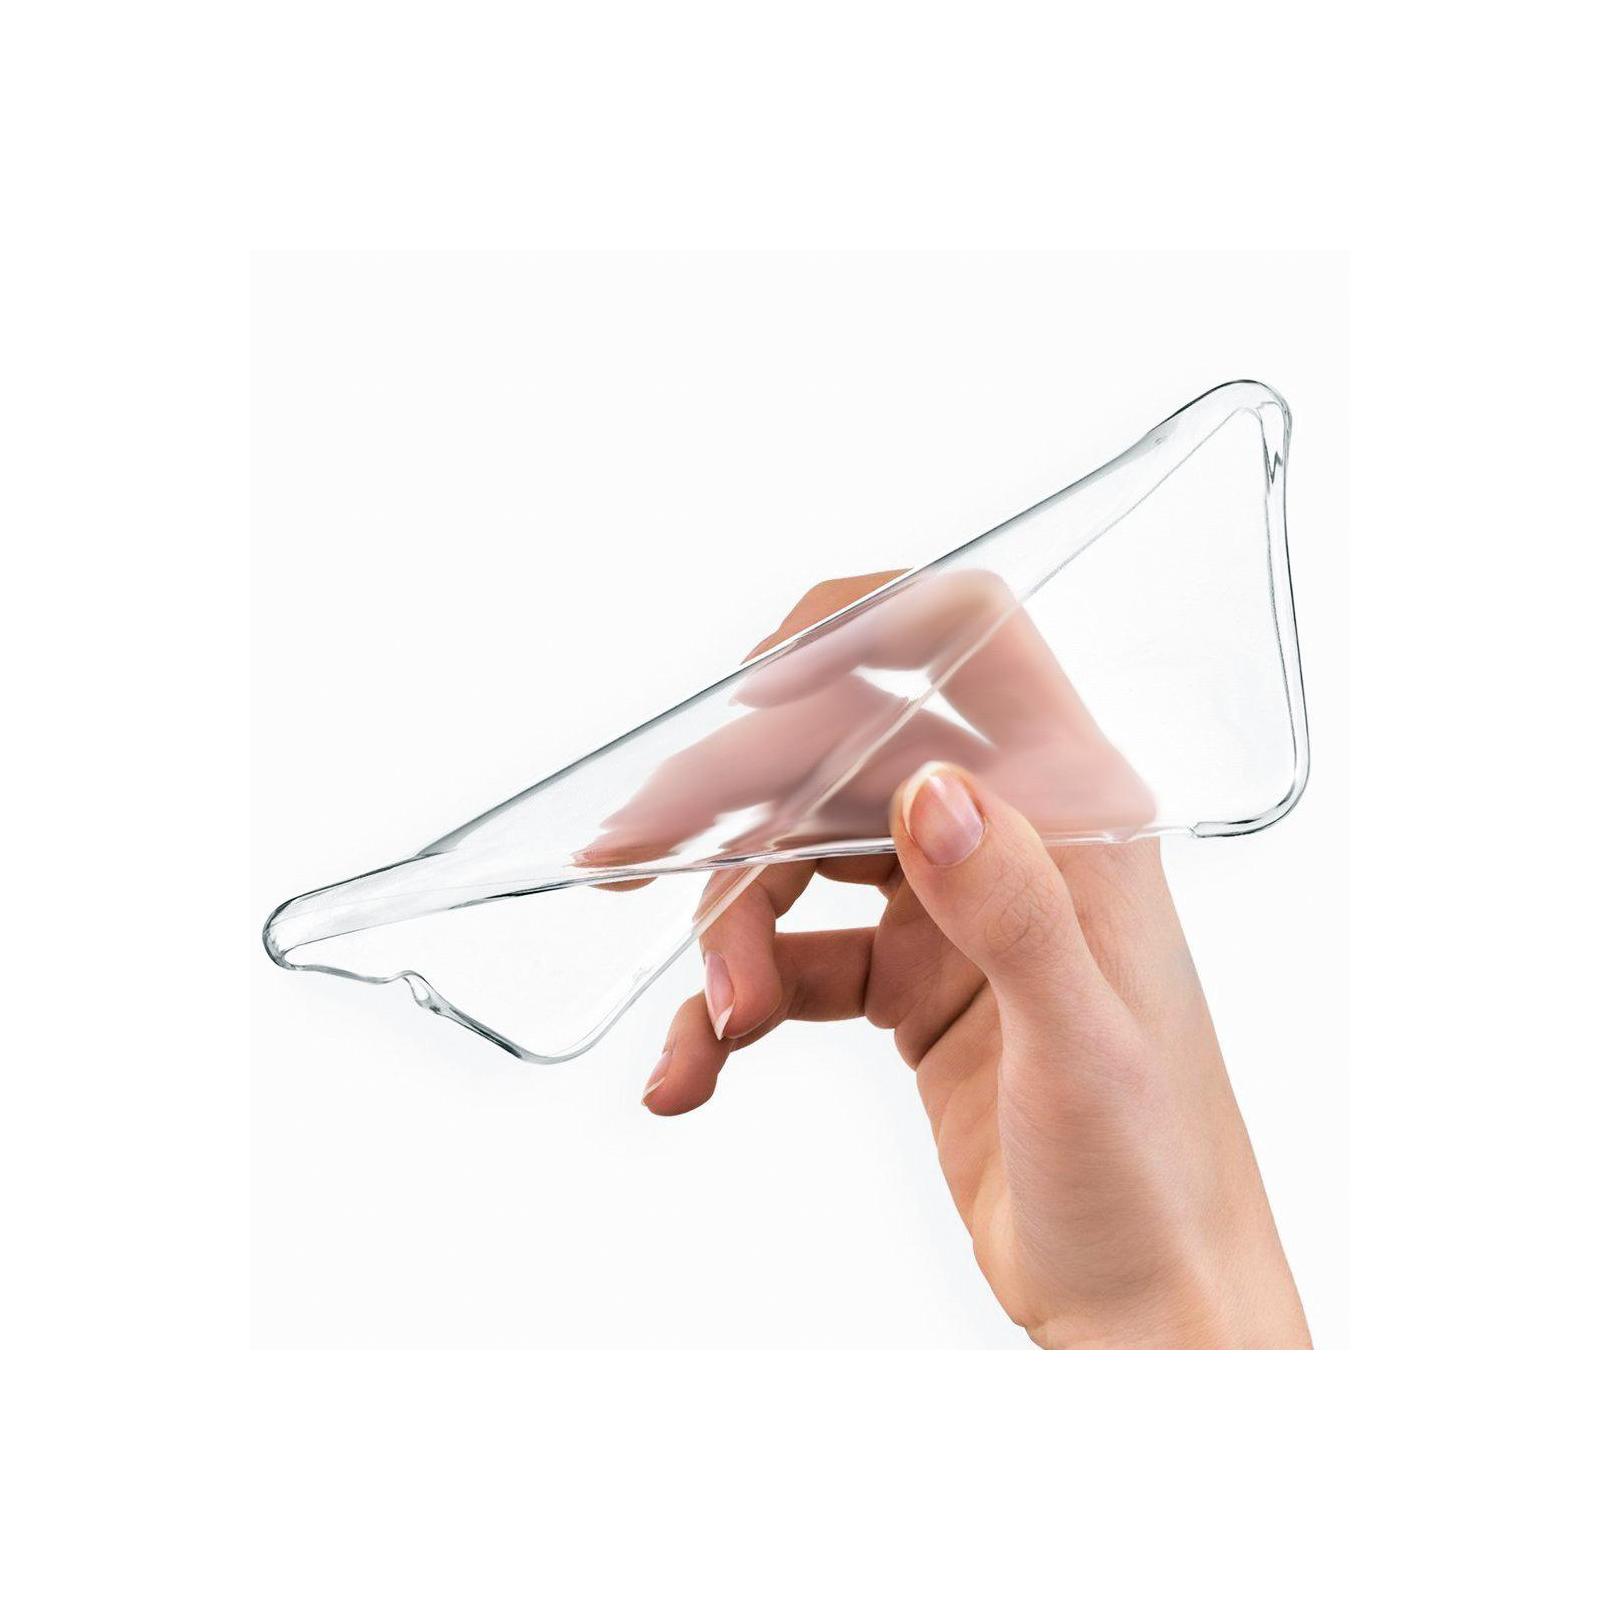 Чехол для моб. телефона SmartCase Samsung Galaxy J7 / J710 TPU Clear (SC-J710) изображение 5